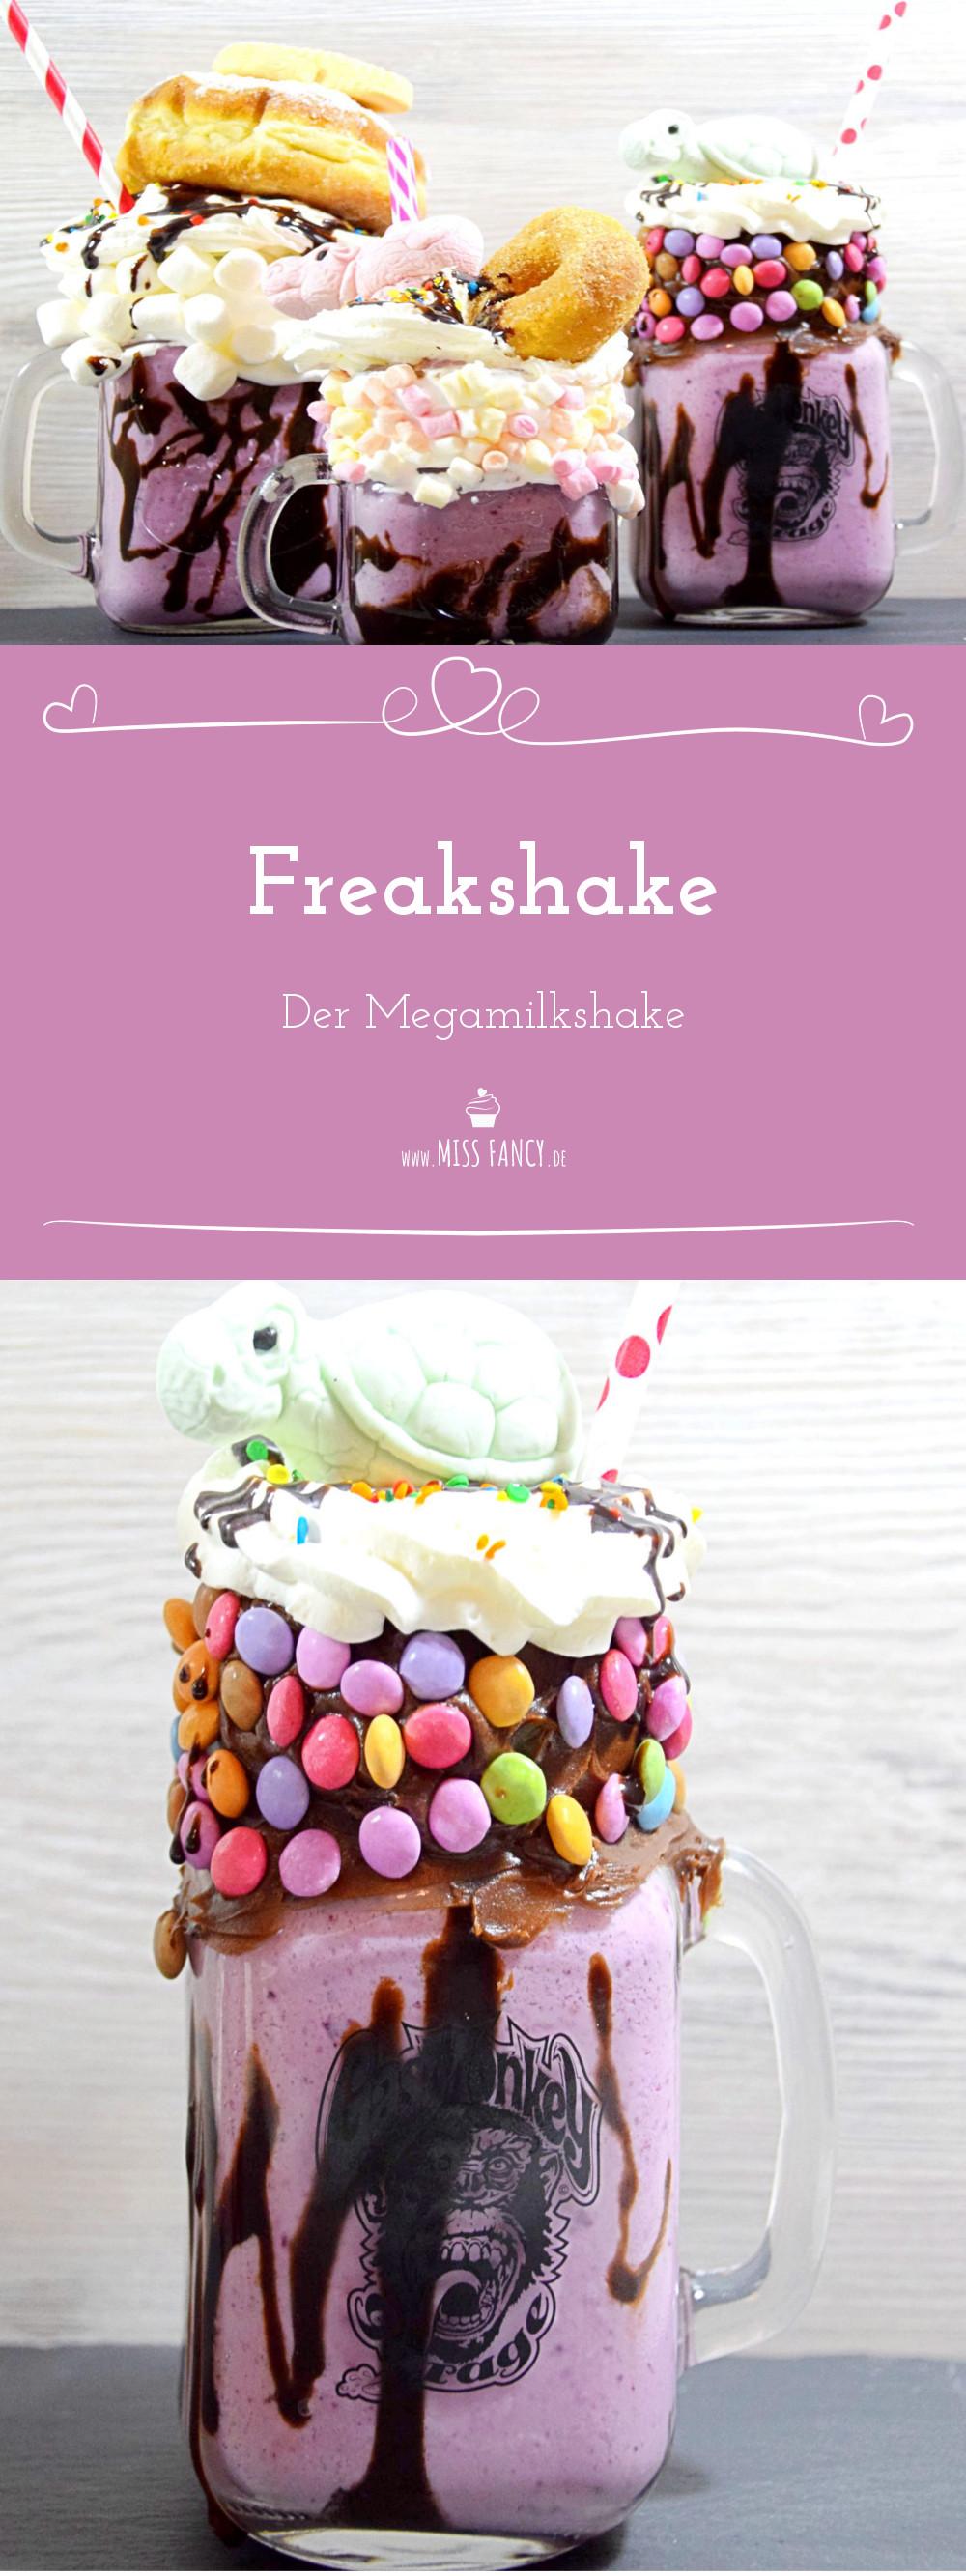 Freakshake der Megamilkshake